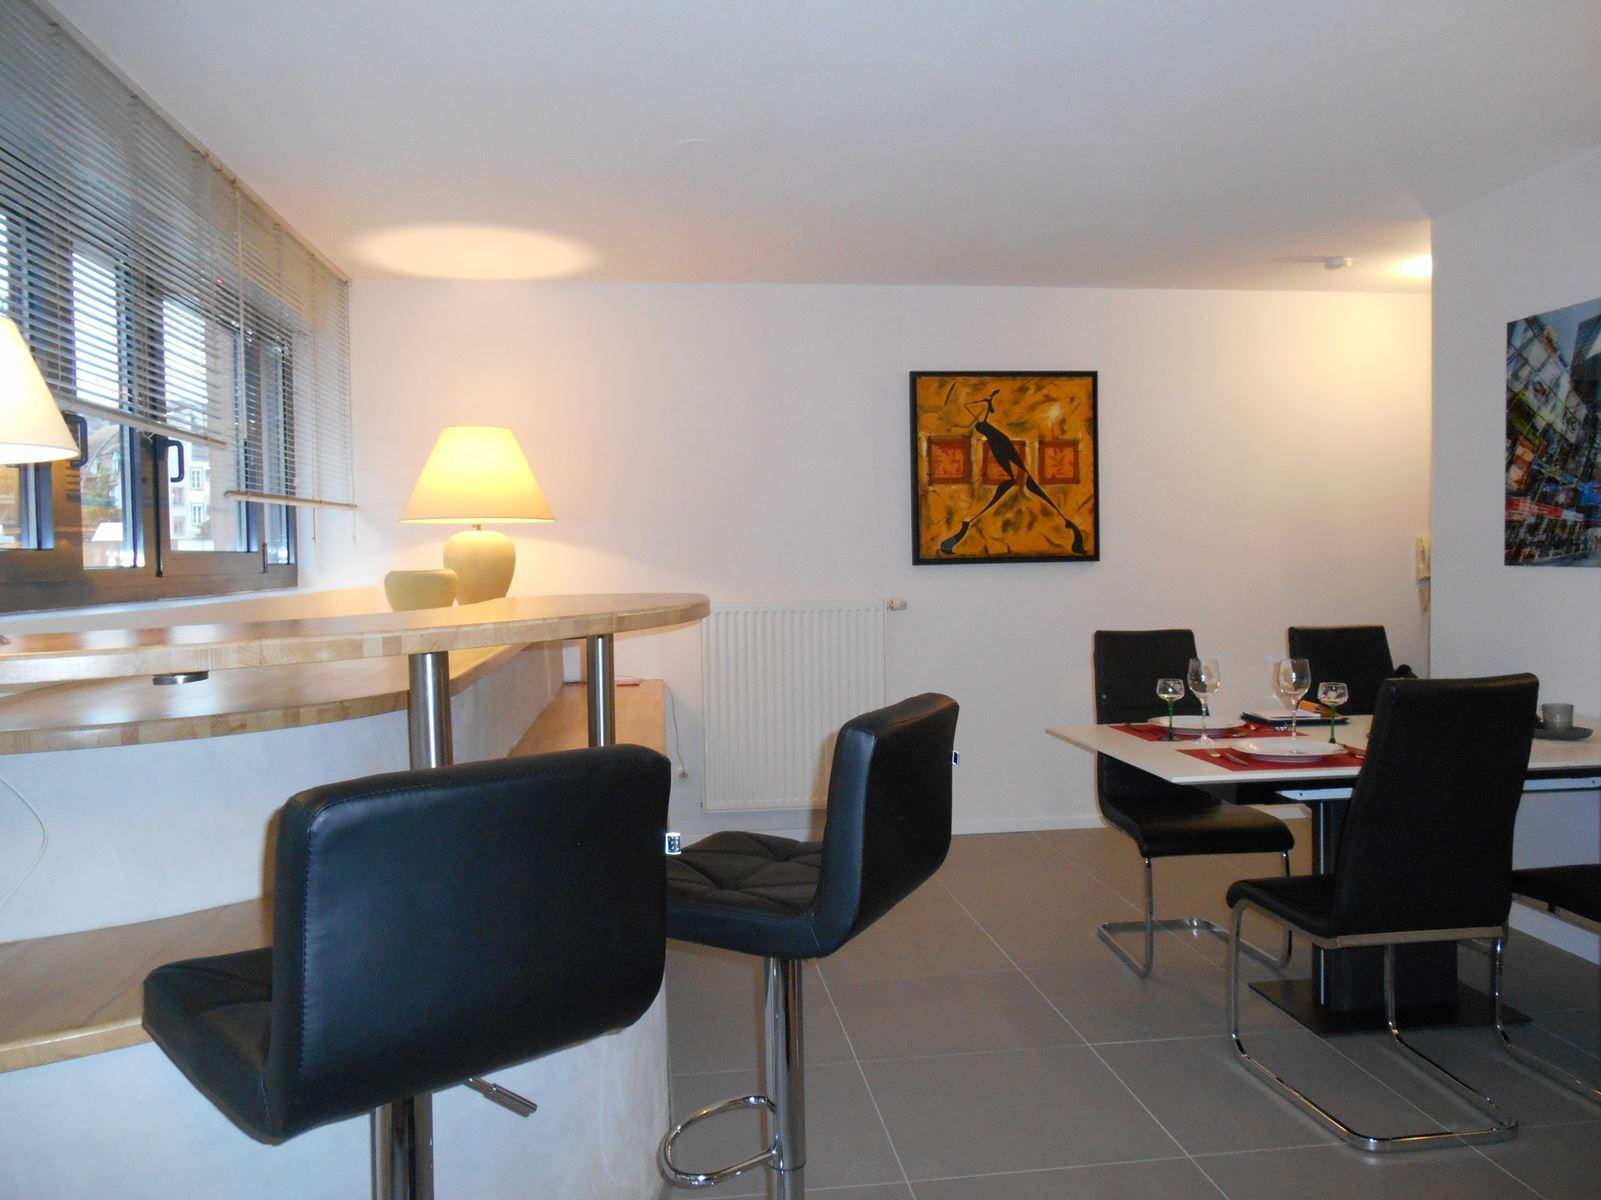 [Jazzy] Spacieux 2 pièces meublé - Gare / rue Kageneck - nos locations - Beausite Immobilier 2